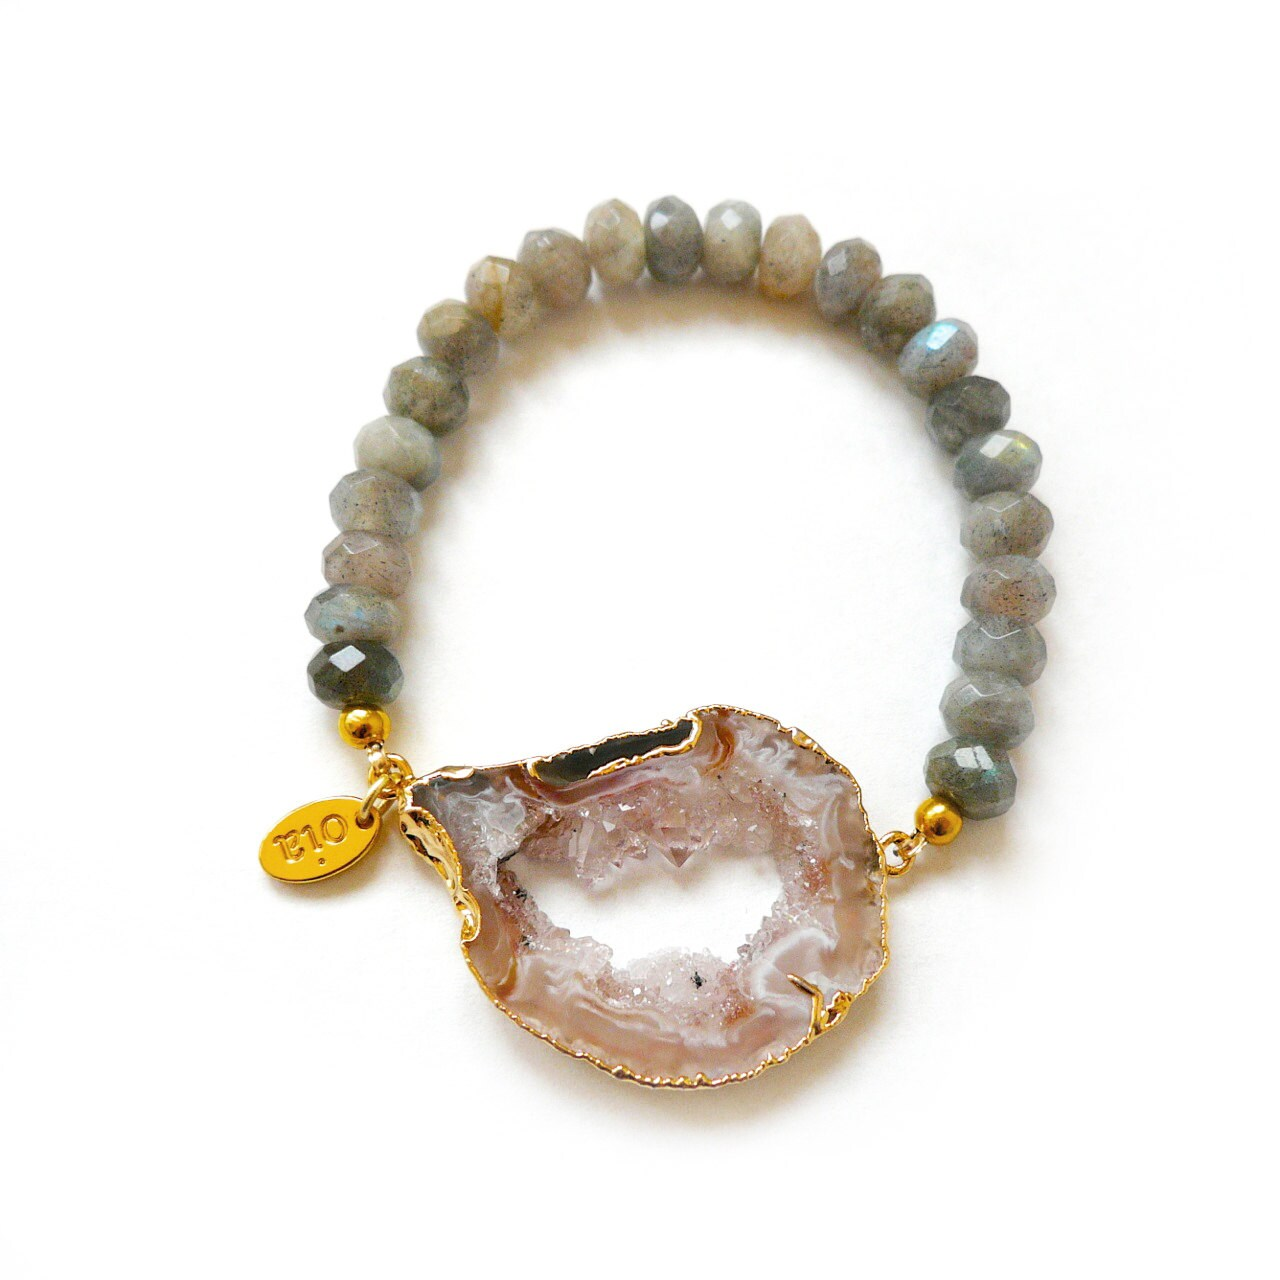 bliss bracelet gold plated druzy agate by elizabethstonejewels